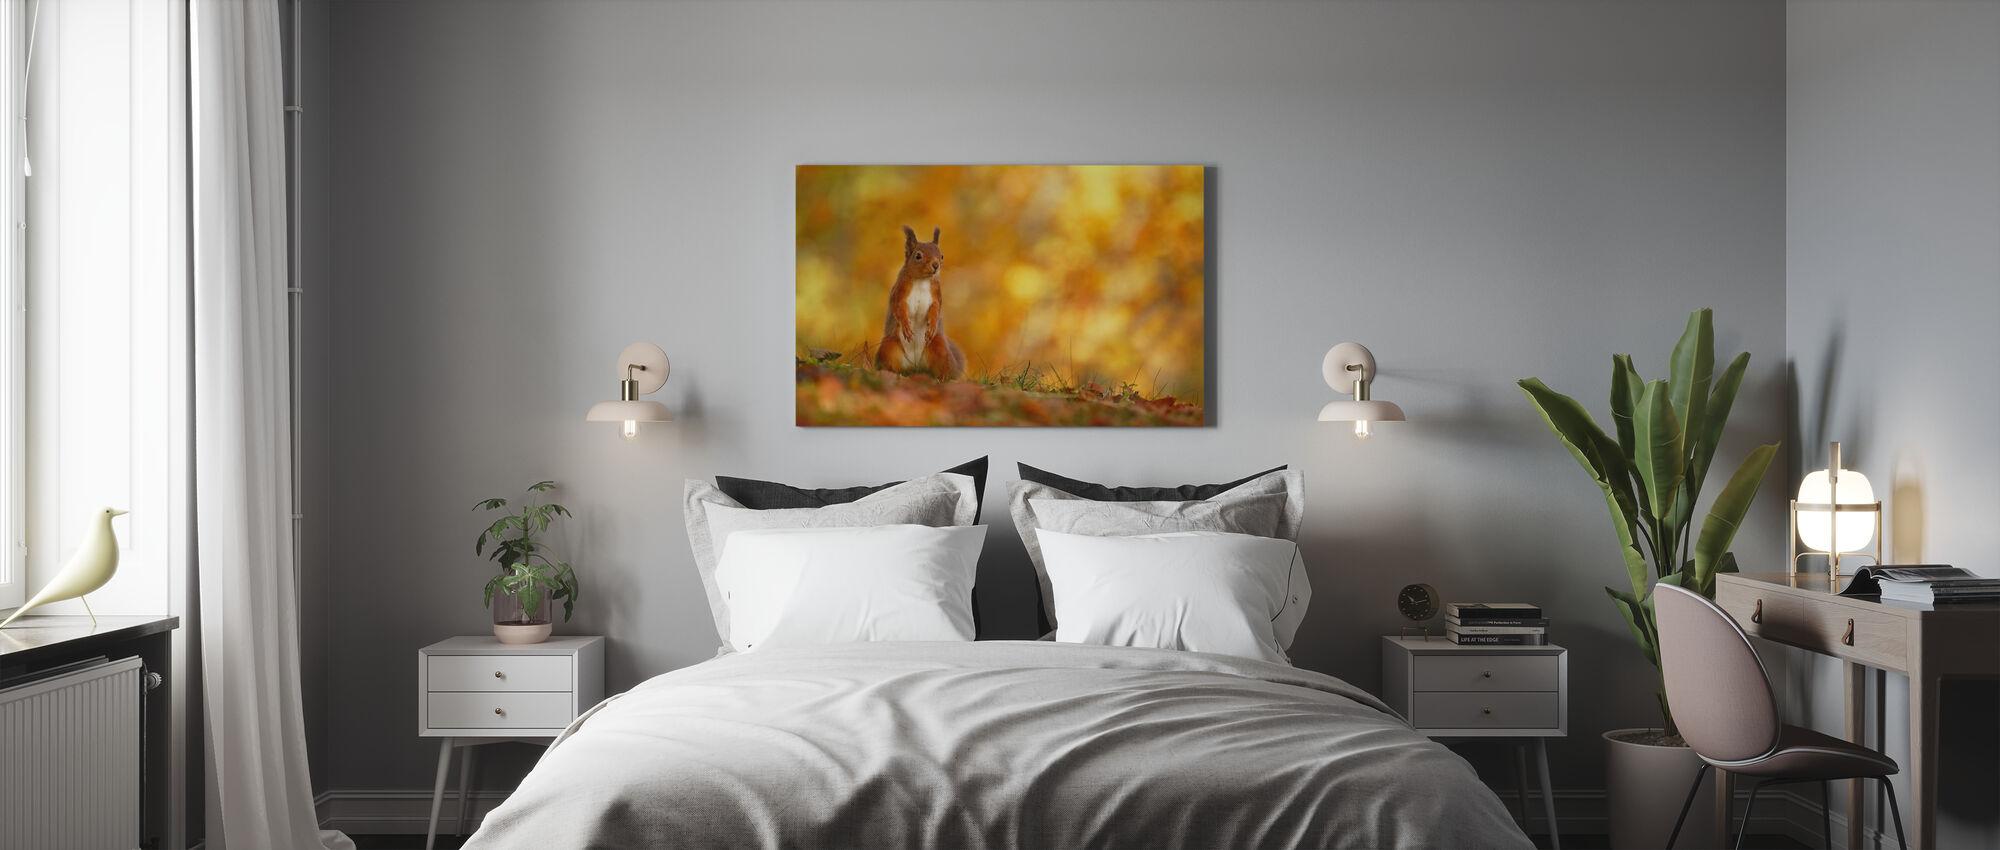 Rødt ekorn på skogbunn - Lerretsbilde - Soverom